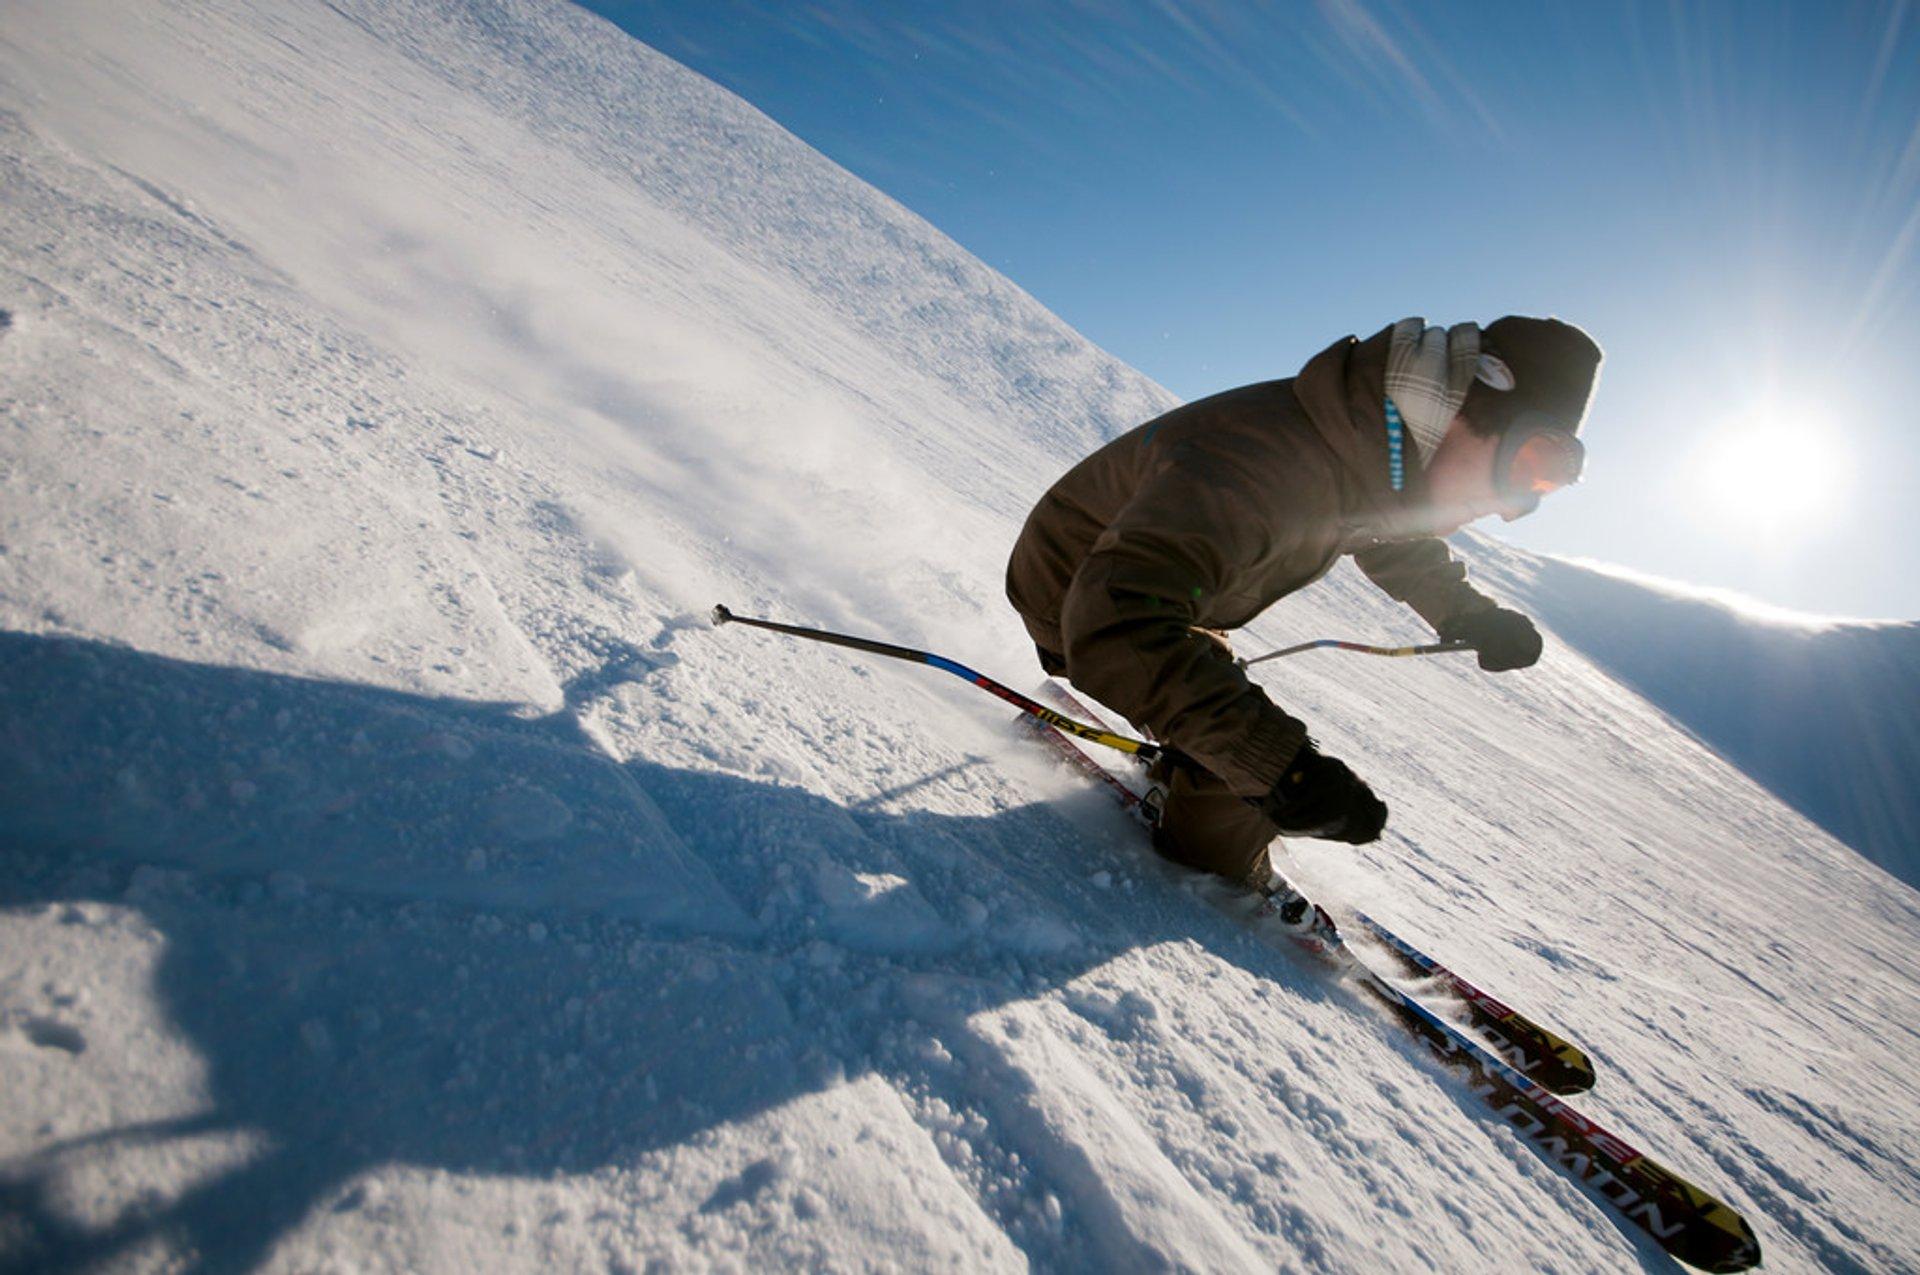 Skiing in Zakopane in Krakow 2020 - Best Time